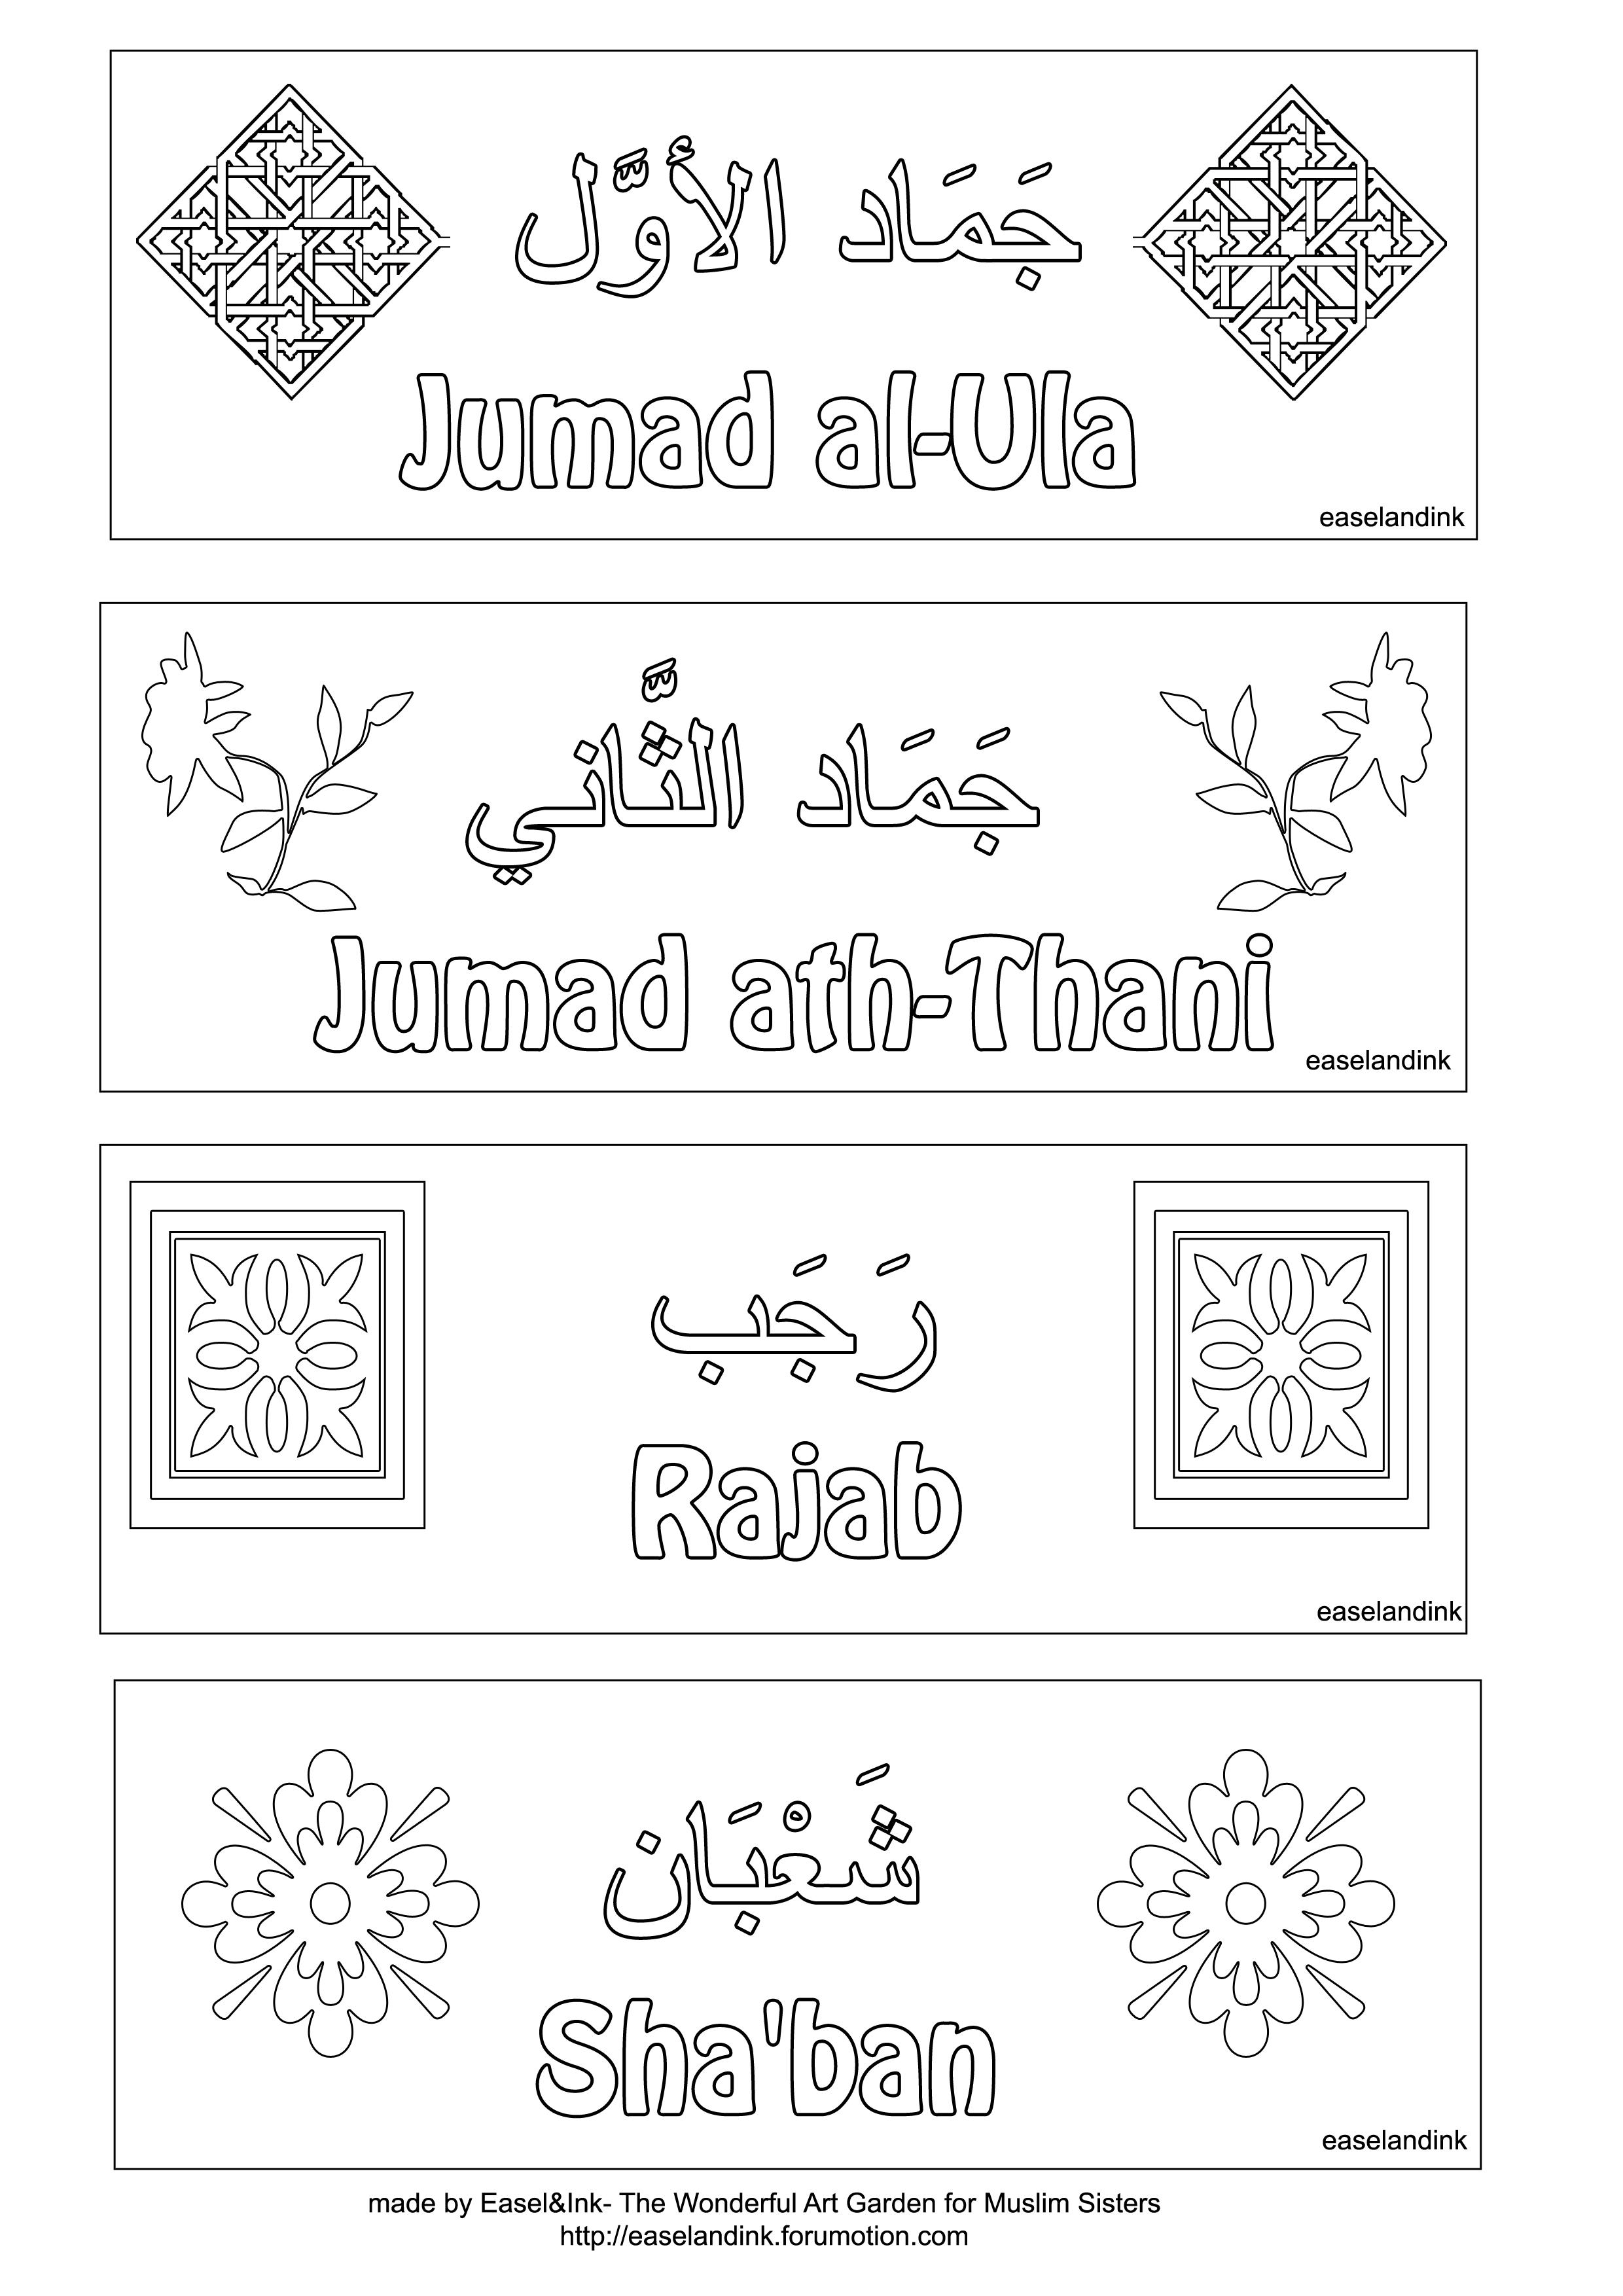 islamic months in english and arabic 5 jumad al ula 6 jumad ath thani 7 rajab 8 sha 39 ban. Black Bedroom Furniture Sets. Home Design Ideas